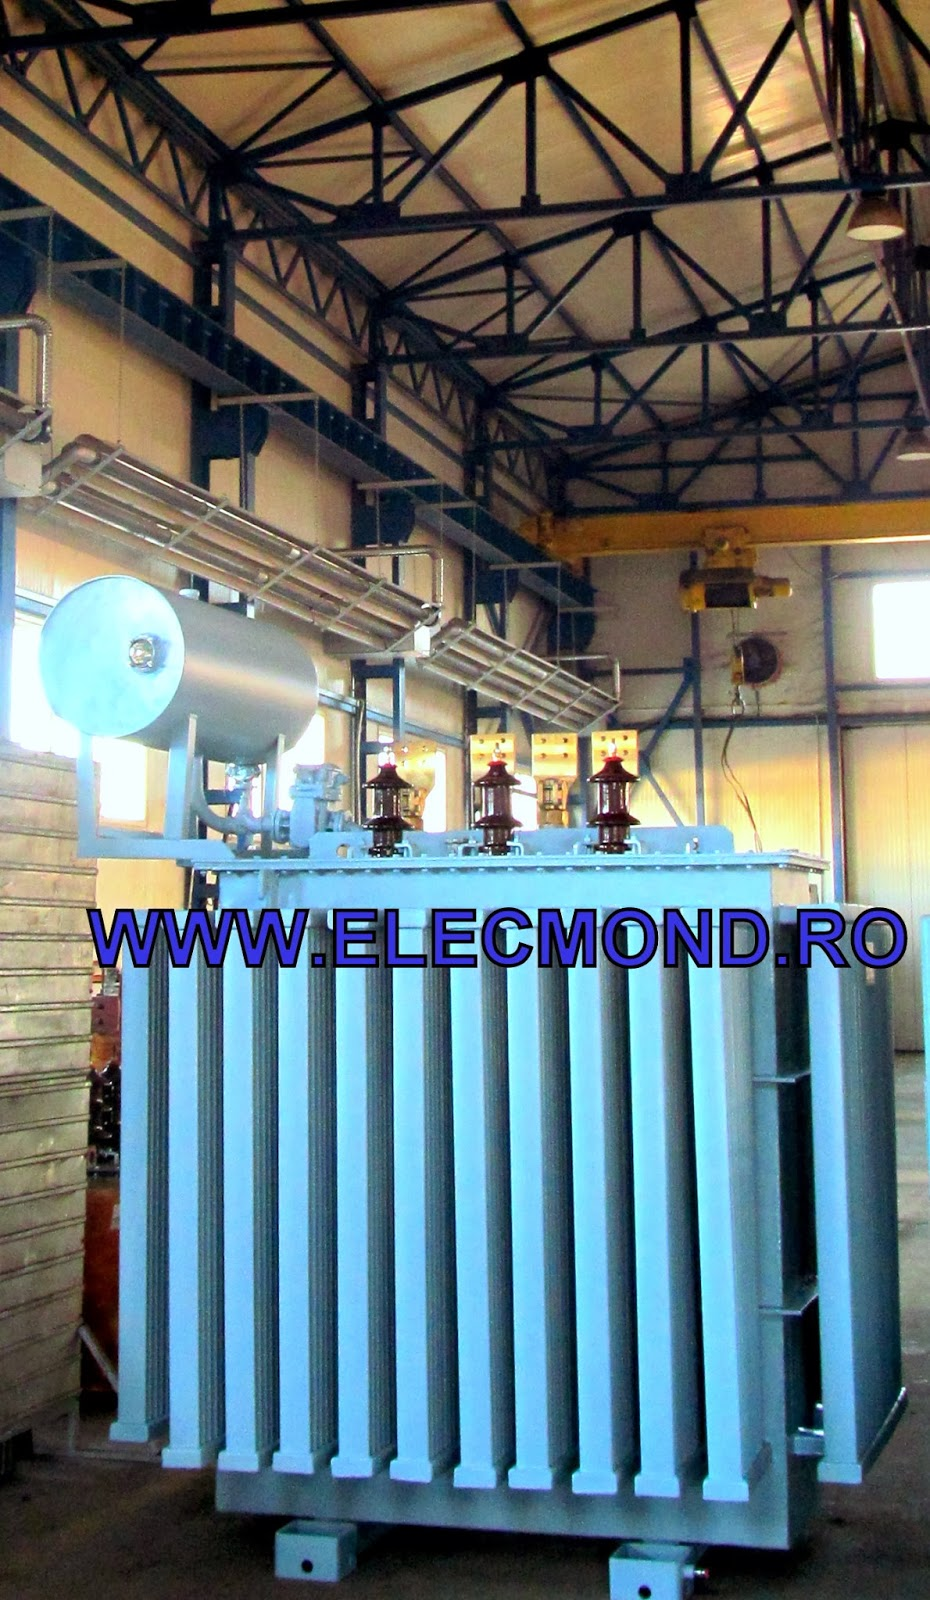 transformator 1600 kVA, Oferta transformatoare ,, elecmond  , transformatoare electrice , transformator , preturi transformatoare , transformator de putere , 1000kVA, 1600kVA, 400kVA , 2000kVA, 630kVA